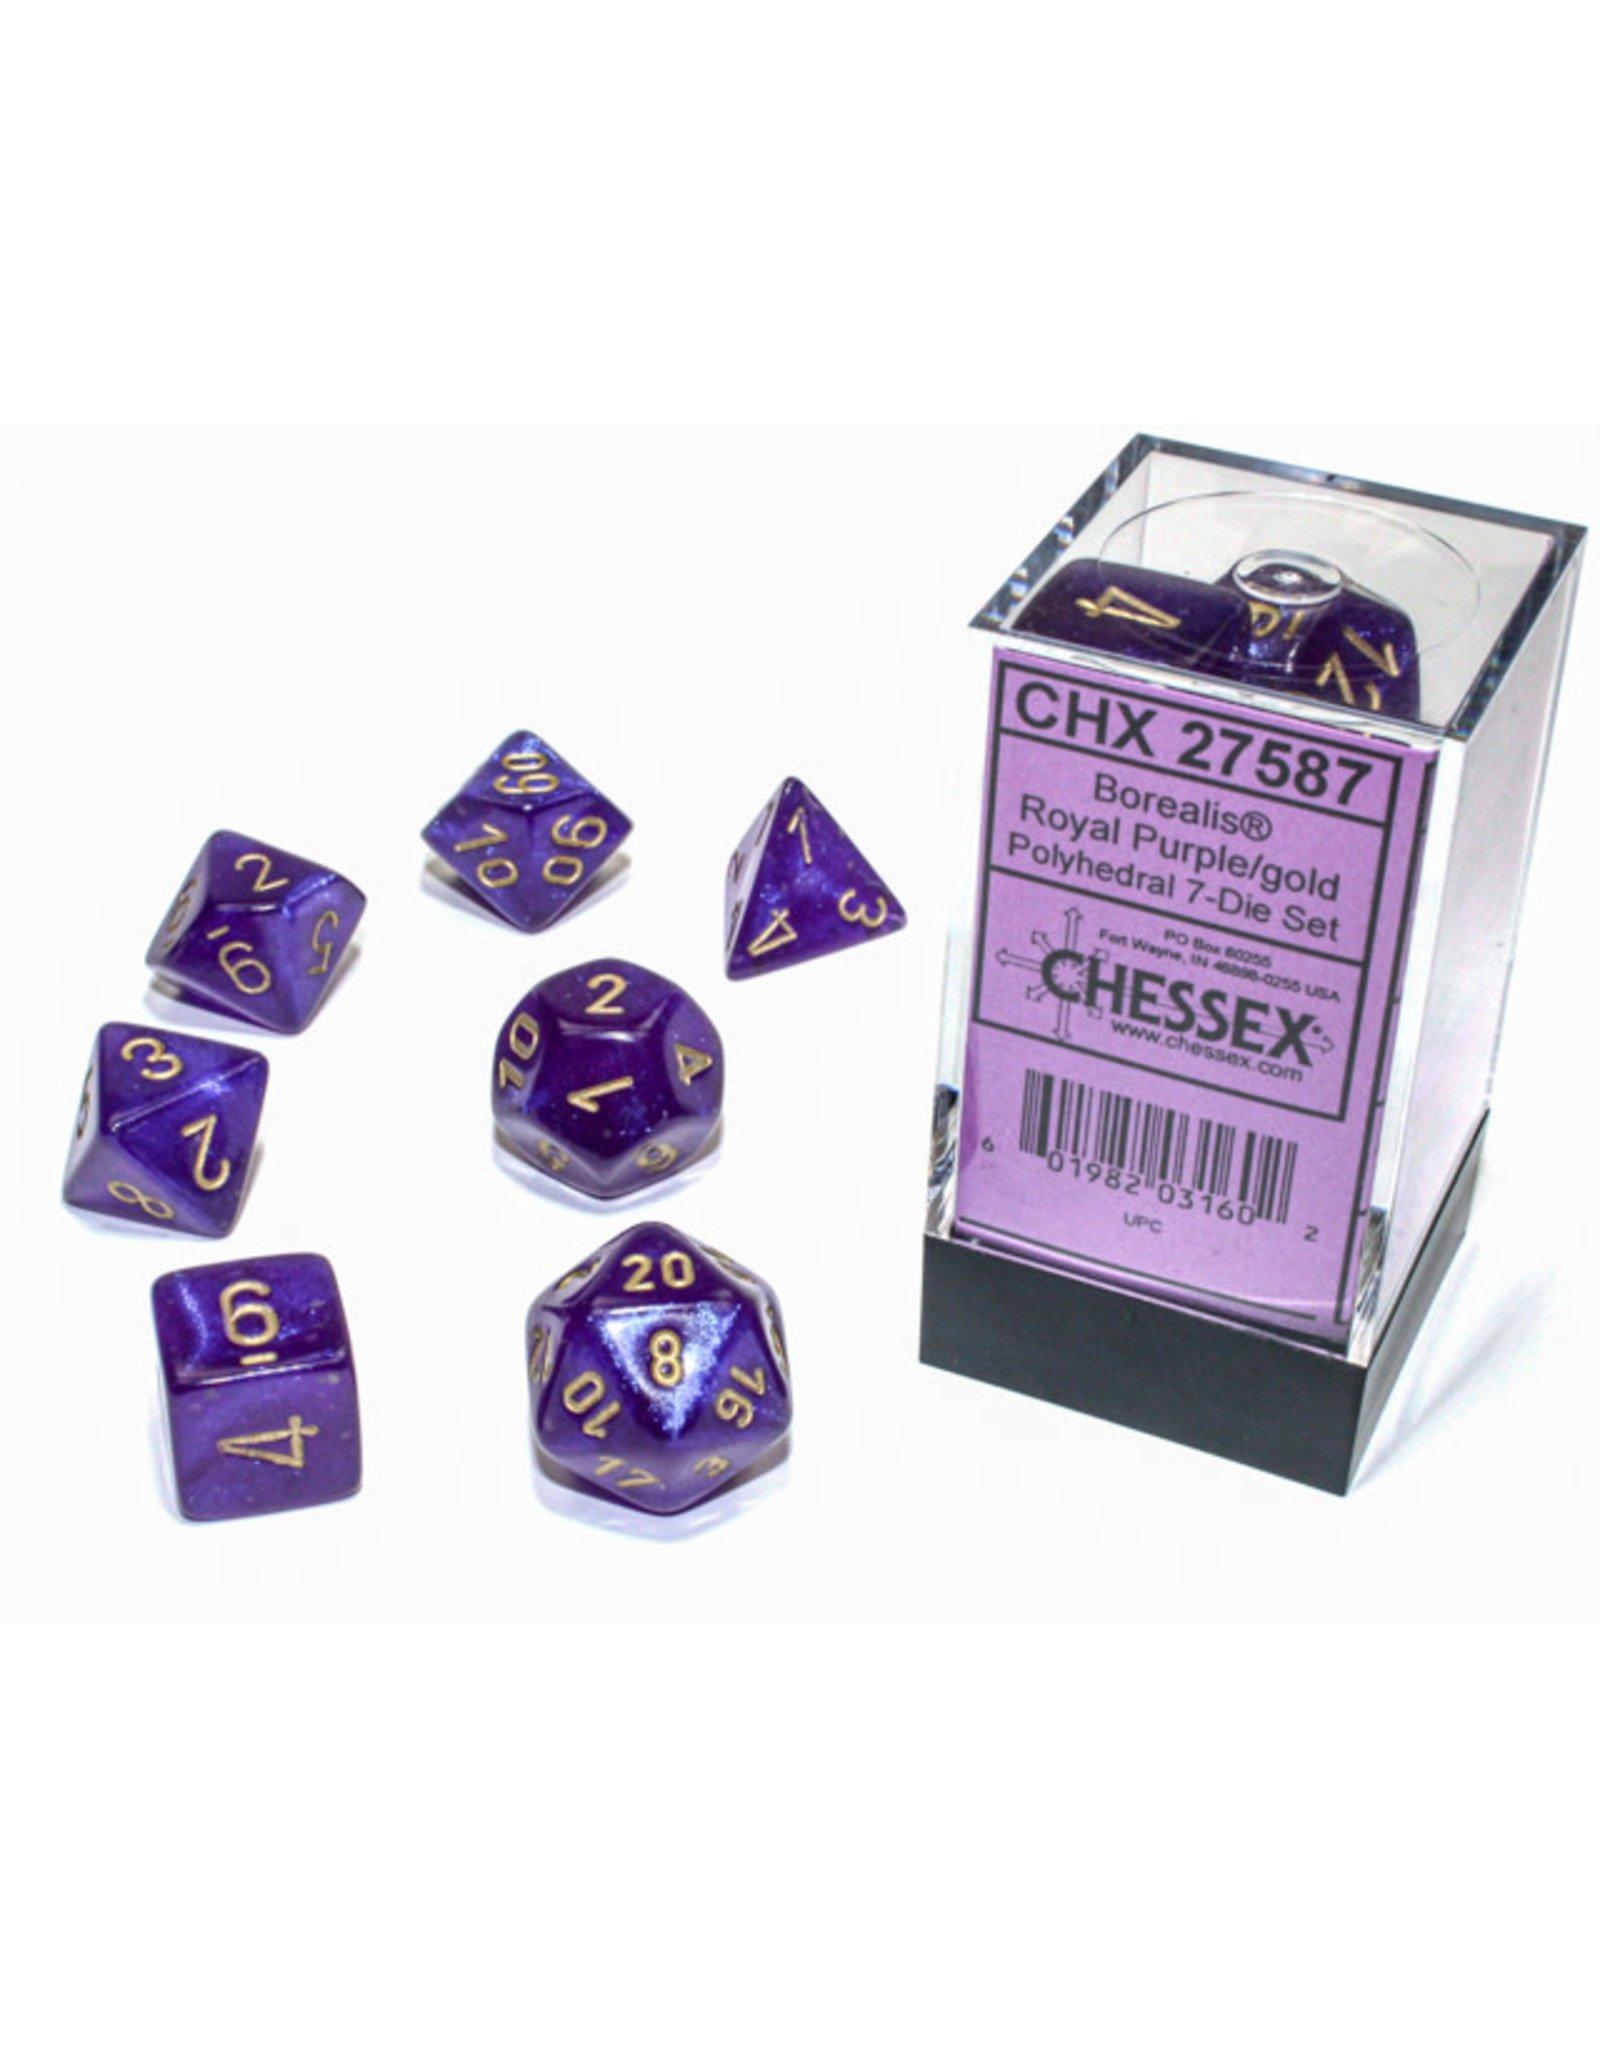 Chessex Borealis: Polyhedral Royal Purple/gold Luminary 7-Die Set CHX27587